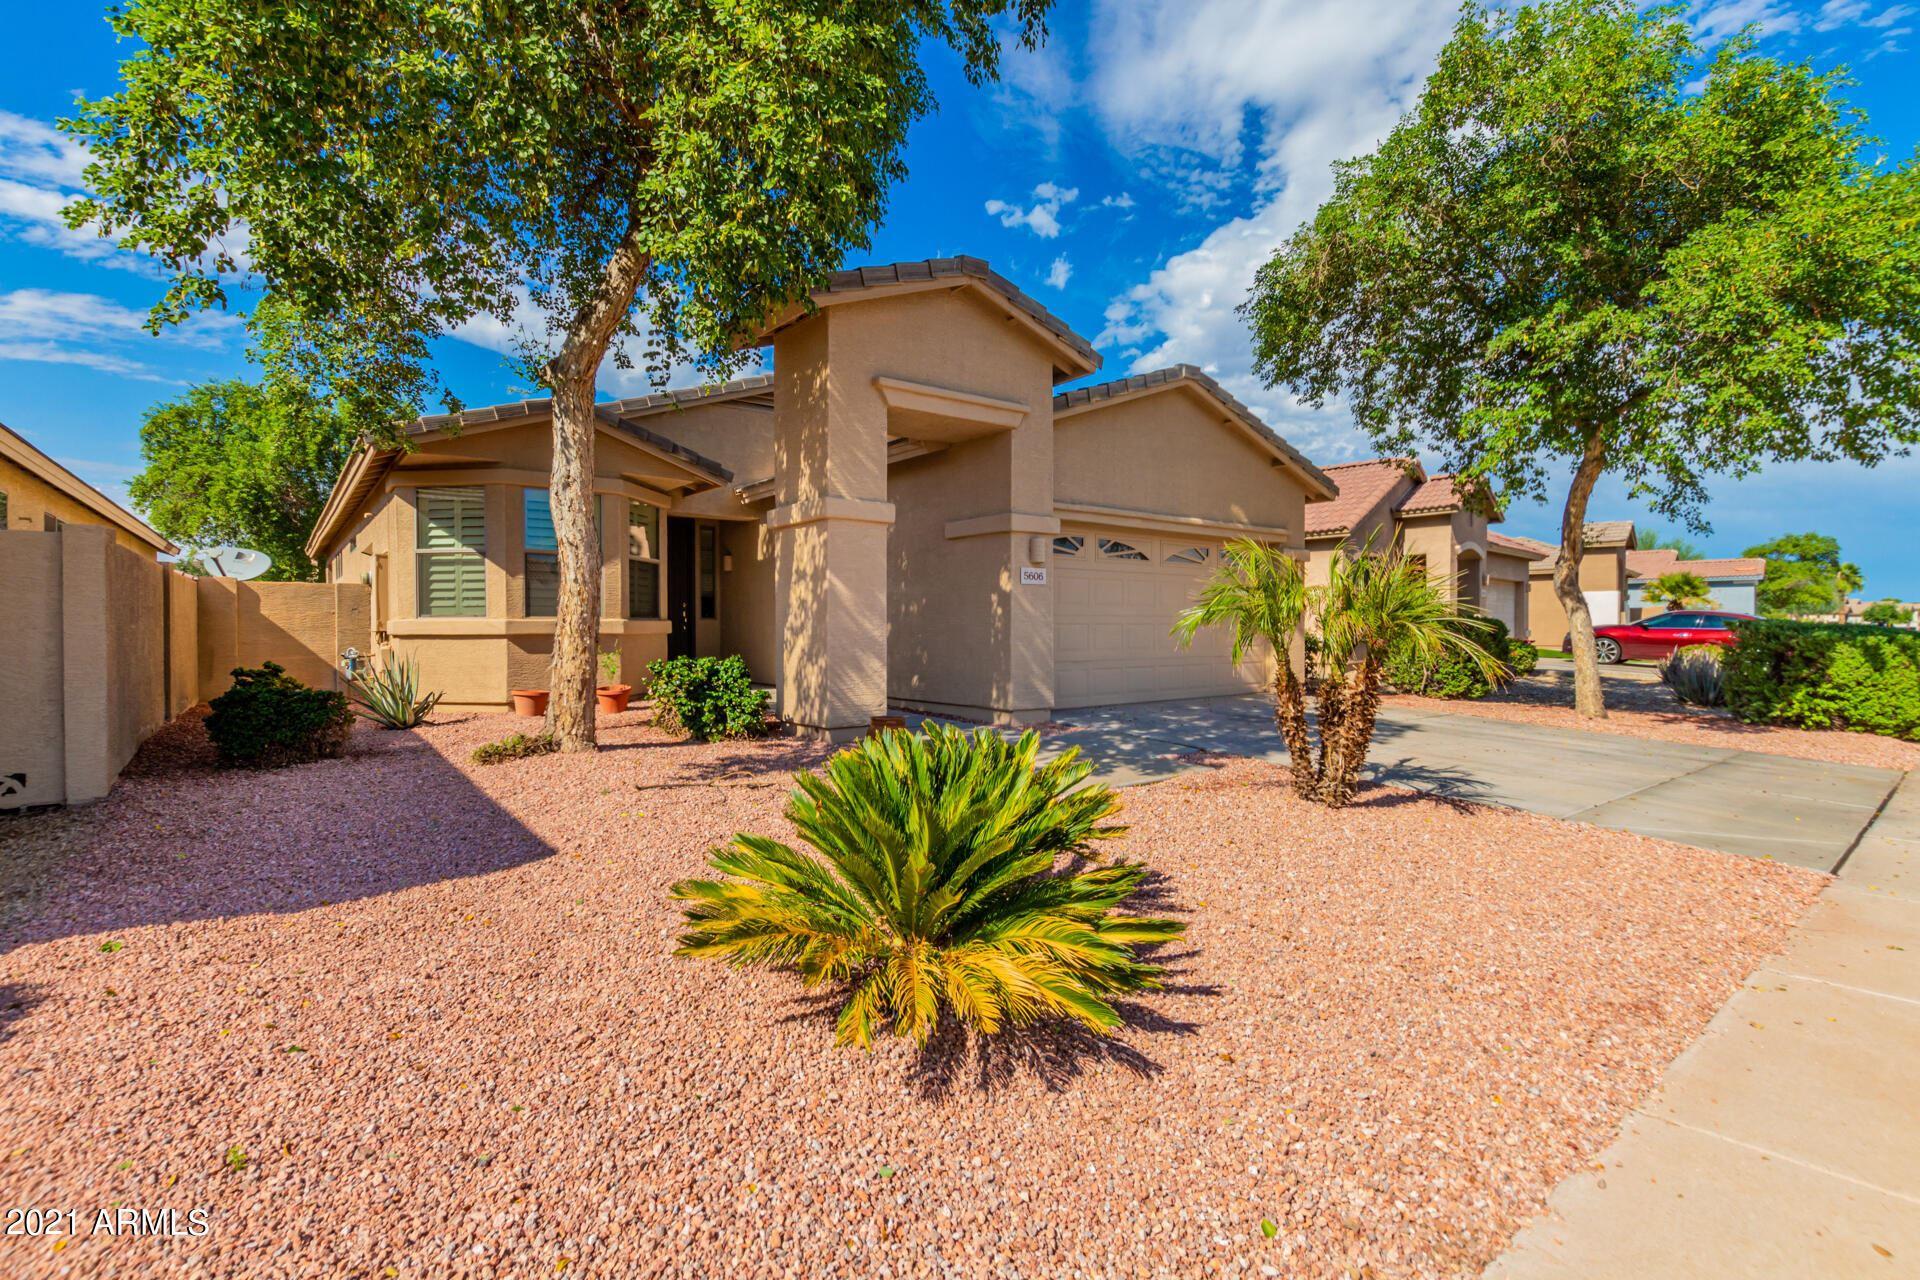 Photo of 5606 W ST ANNE Avenue, Laveen, AZ 85339 (MLS # 6304570)